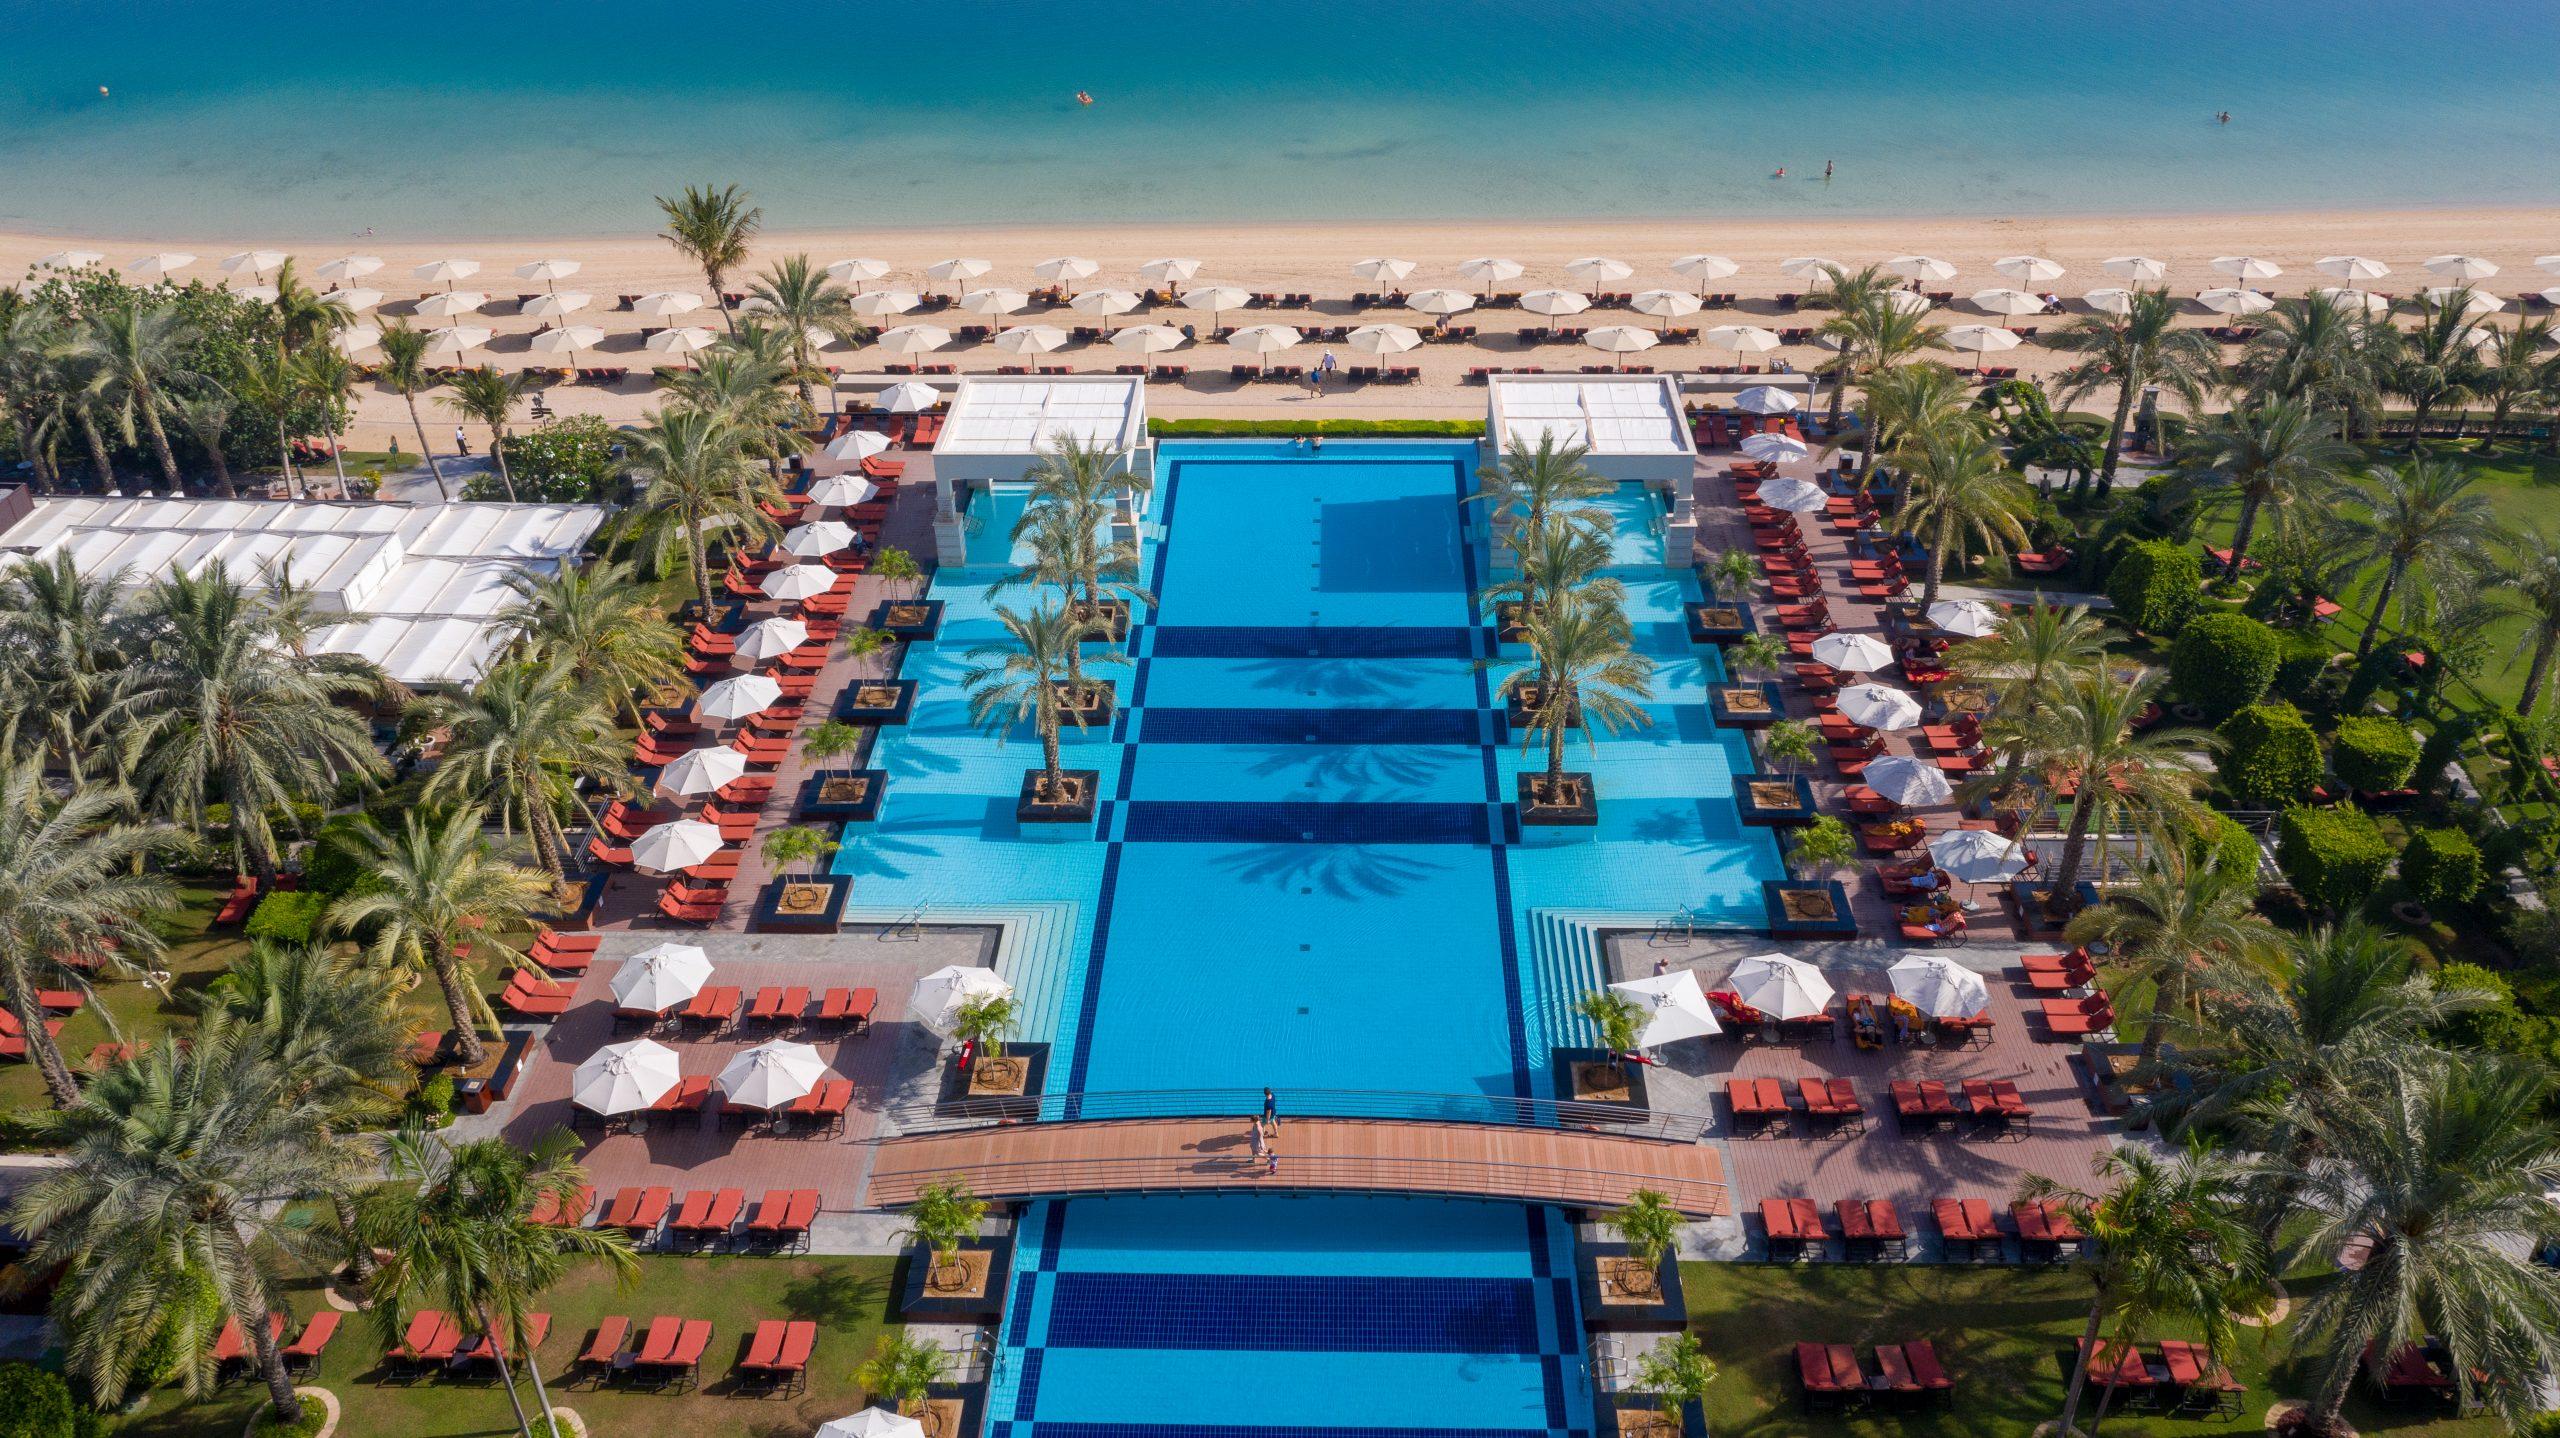 Jumeirah Zabeel Saray offer